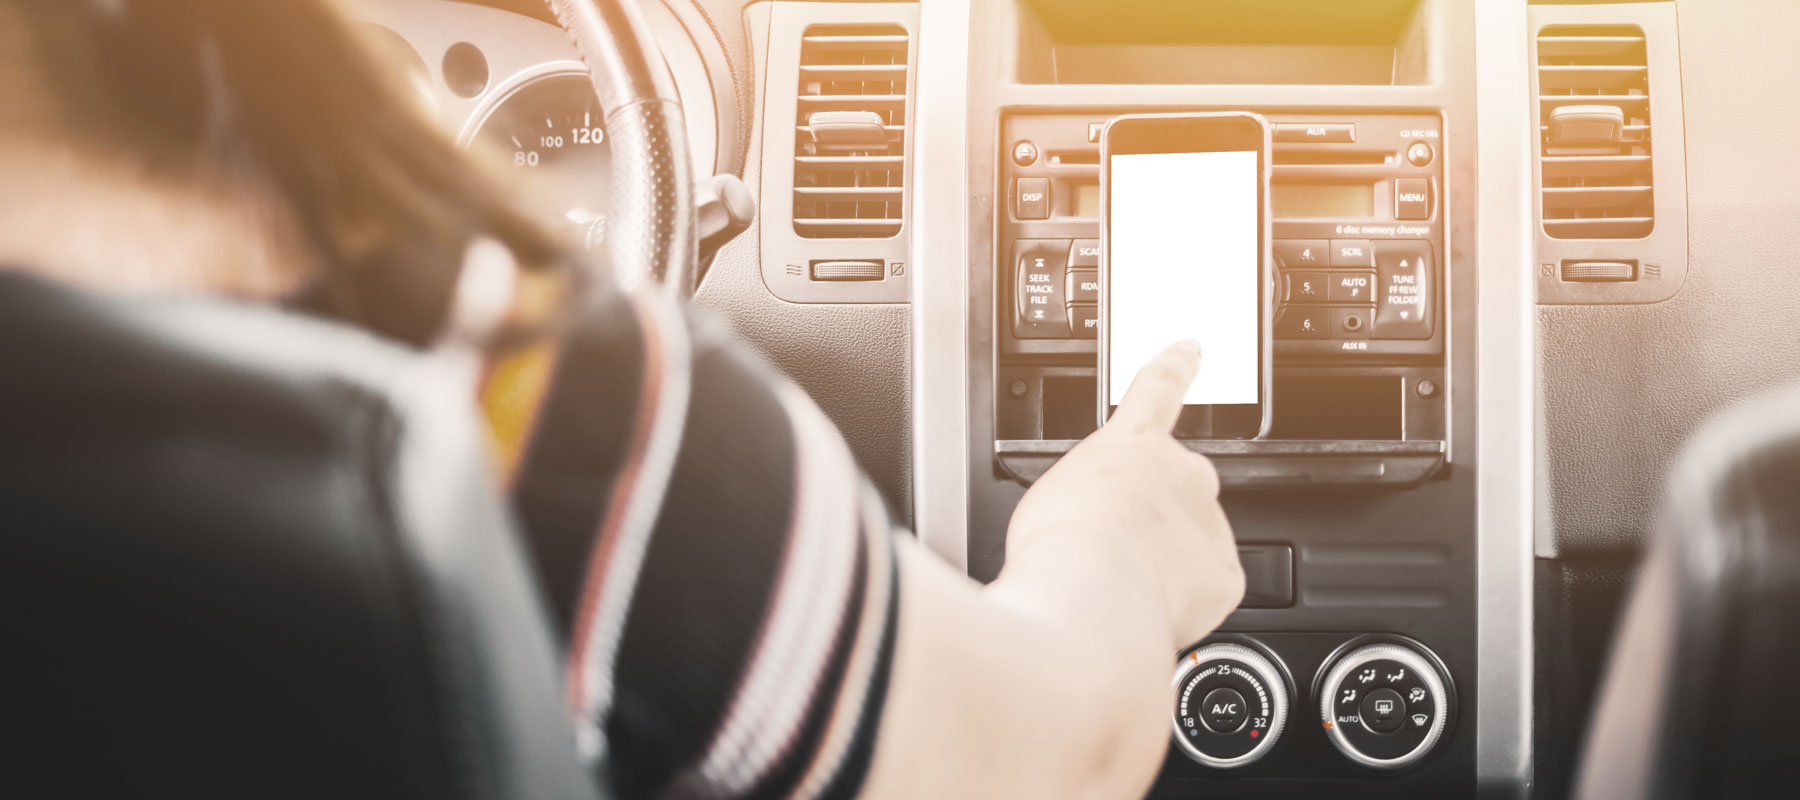 Hörgeräte Konnektivität 2019